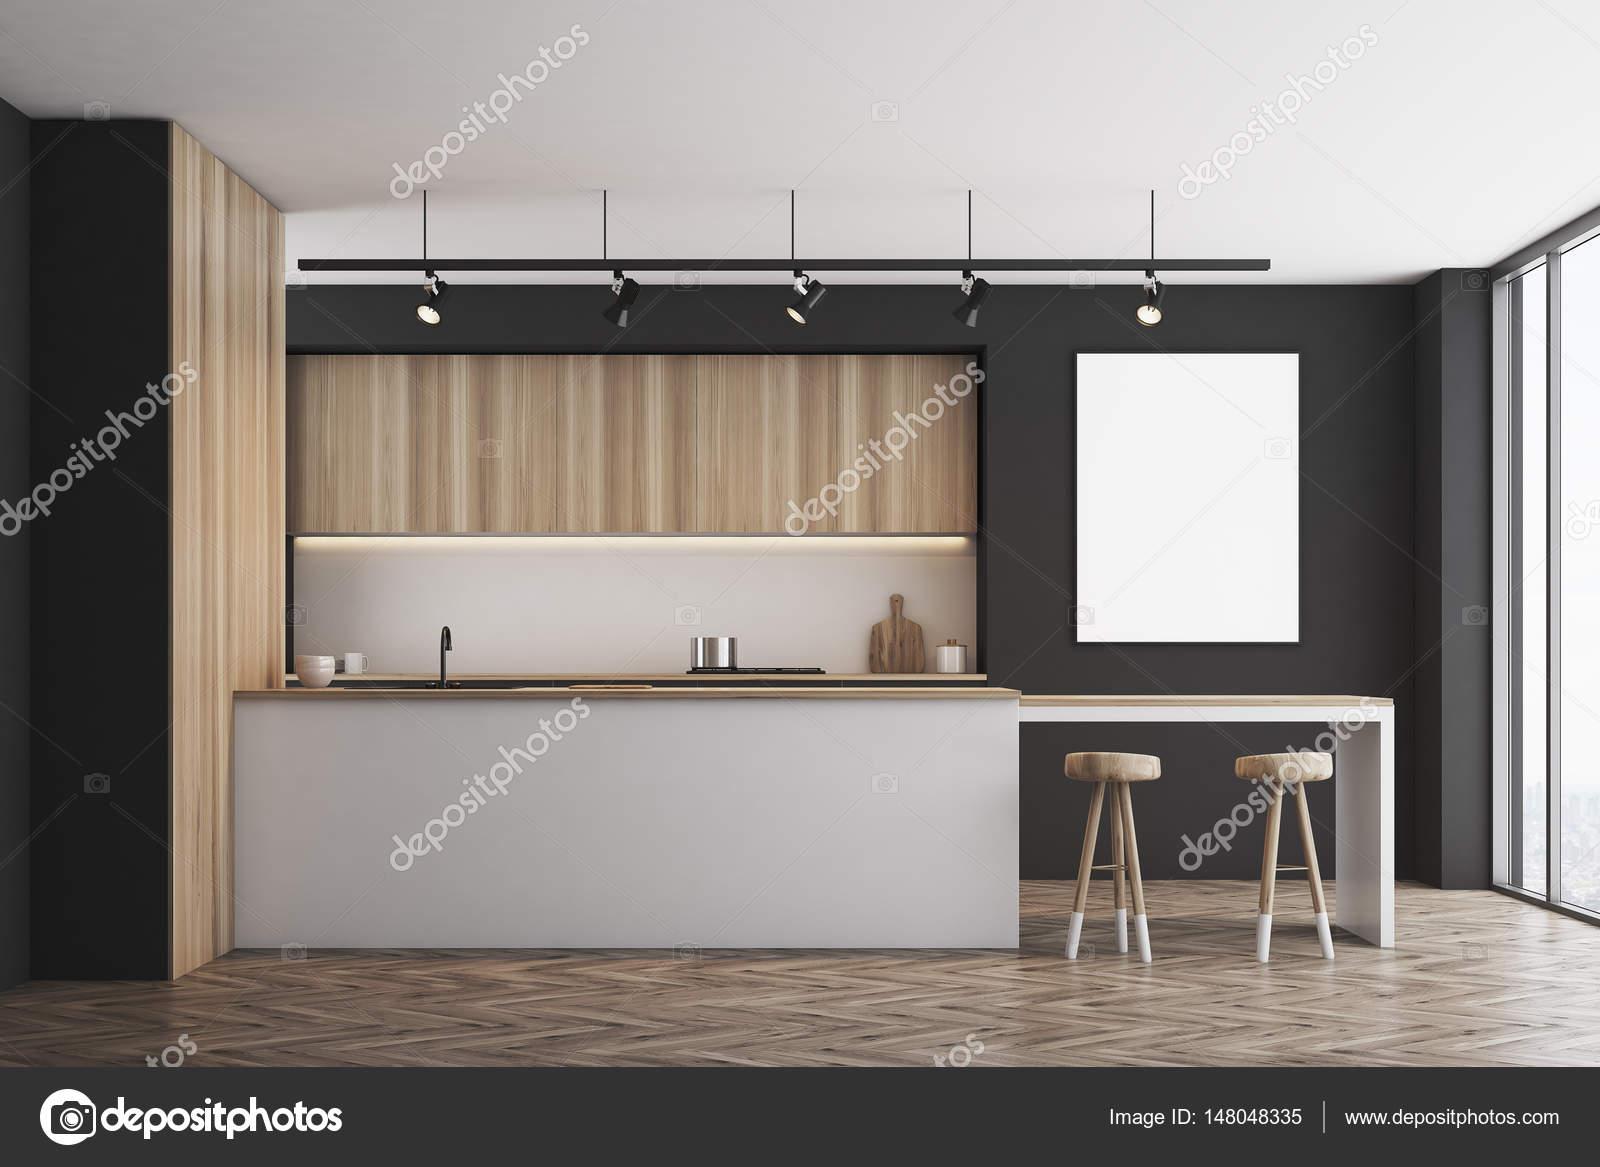 best poster f r k che ideas. Black Bedroom Furniture Sets. Home Design Ideas